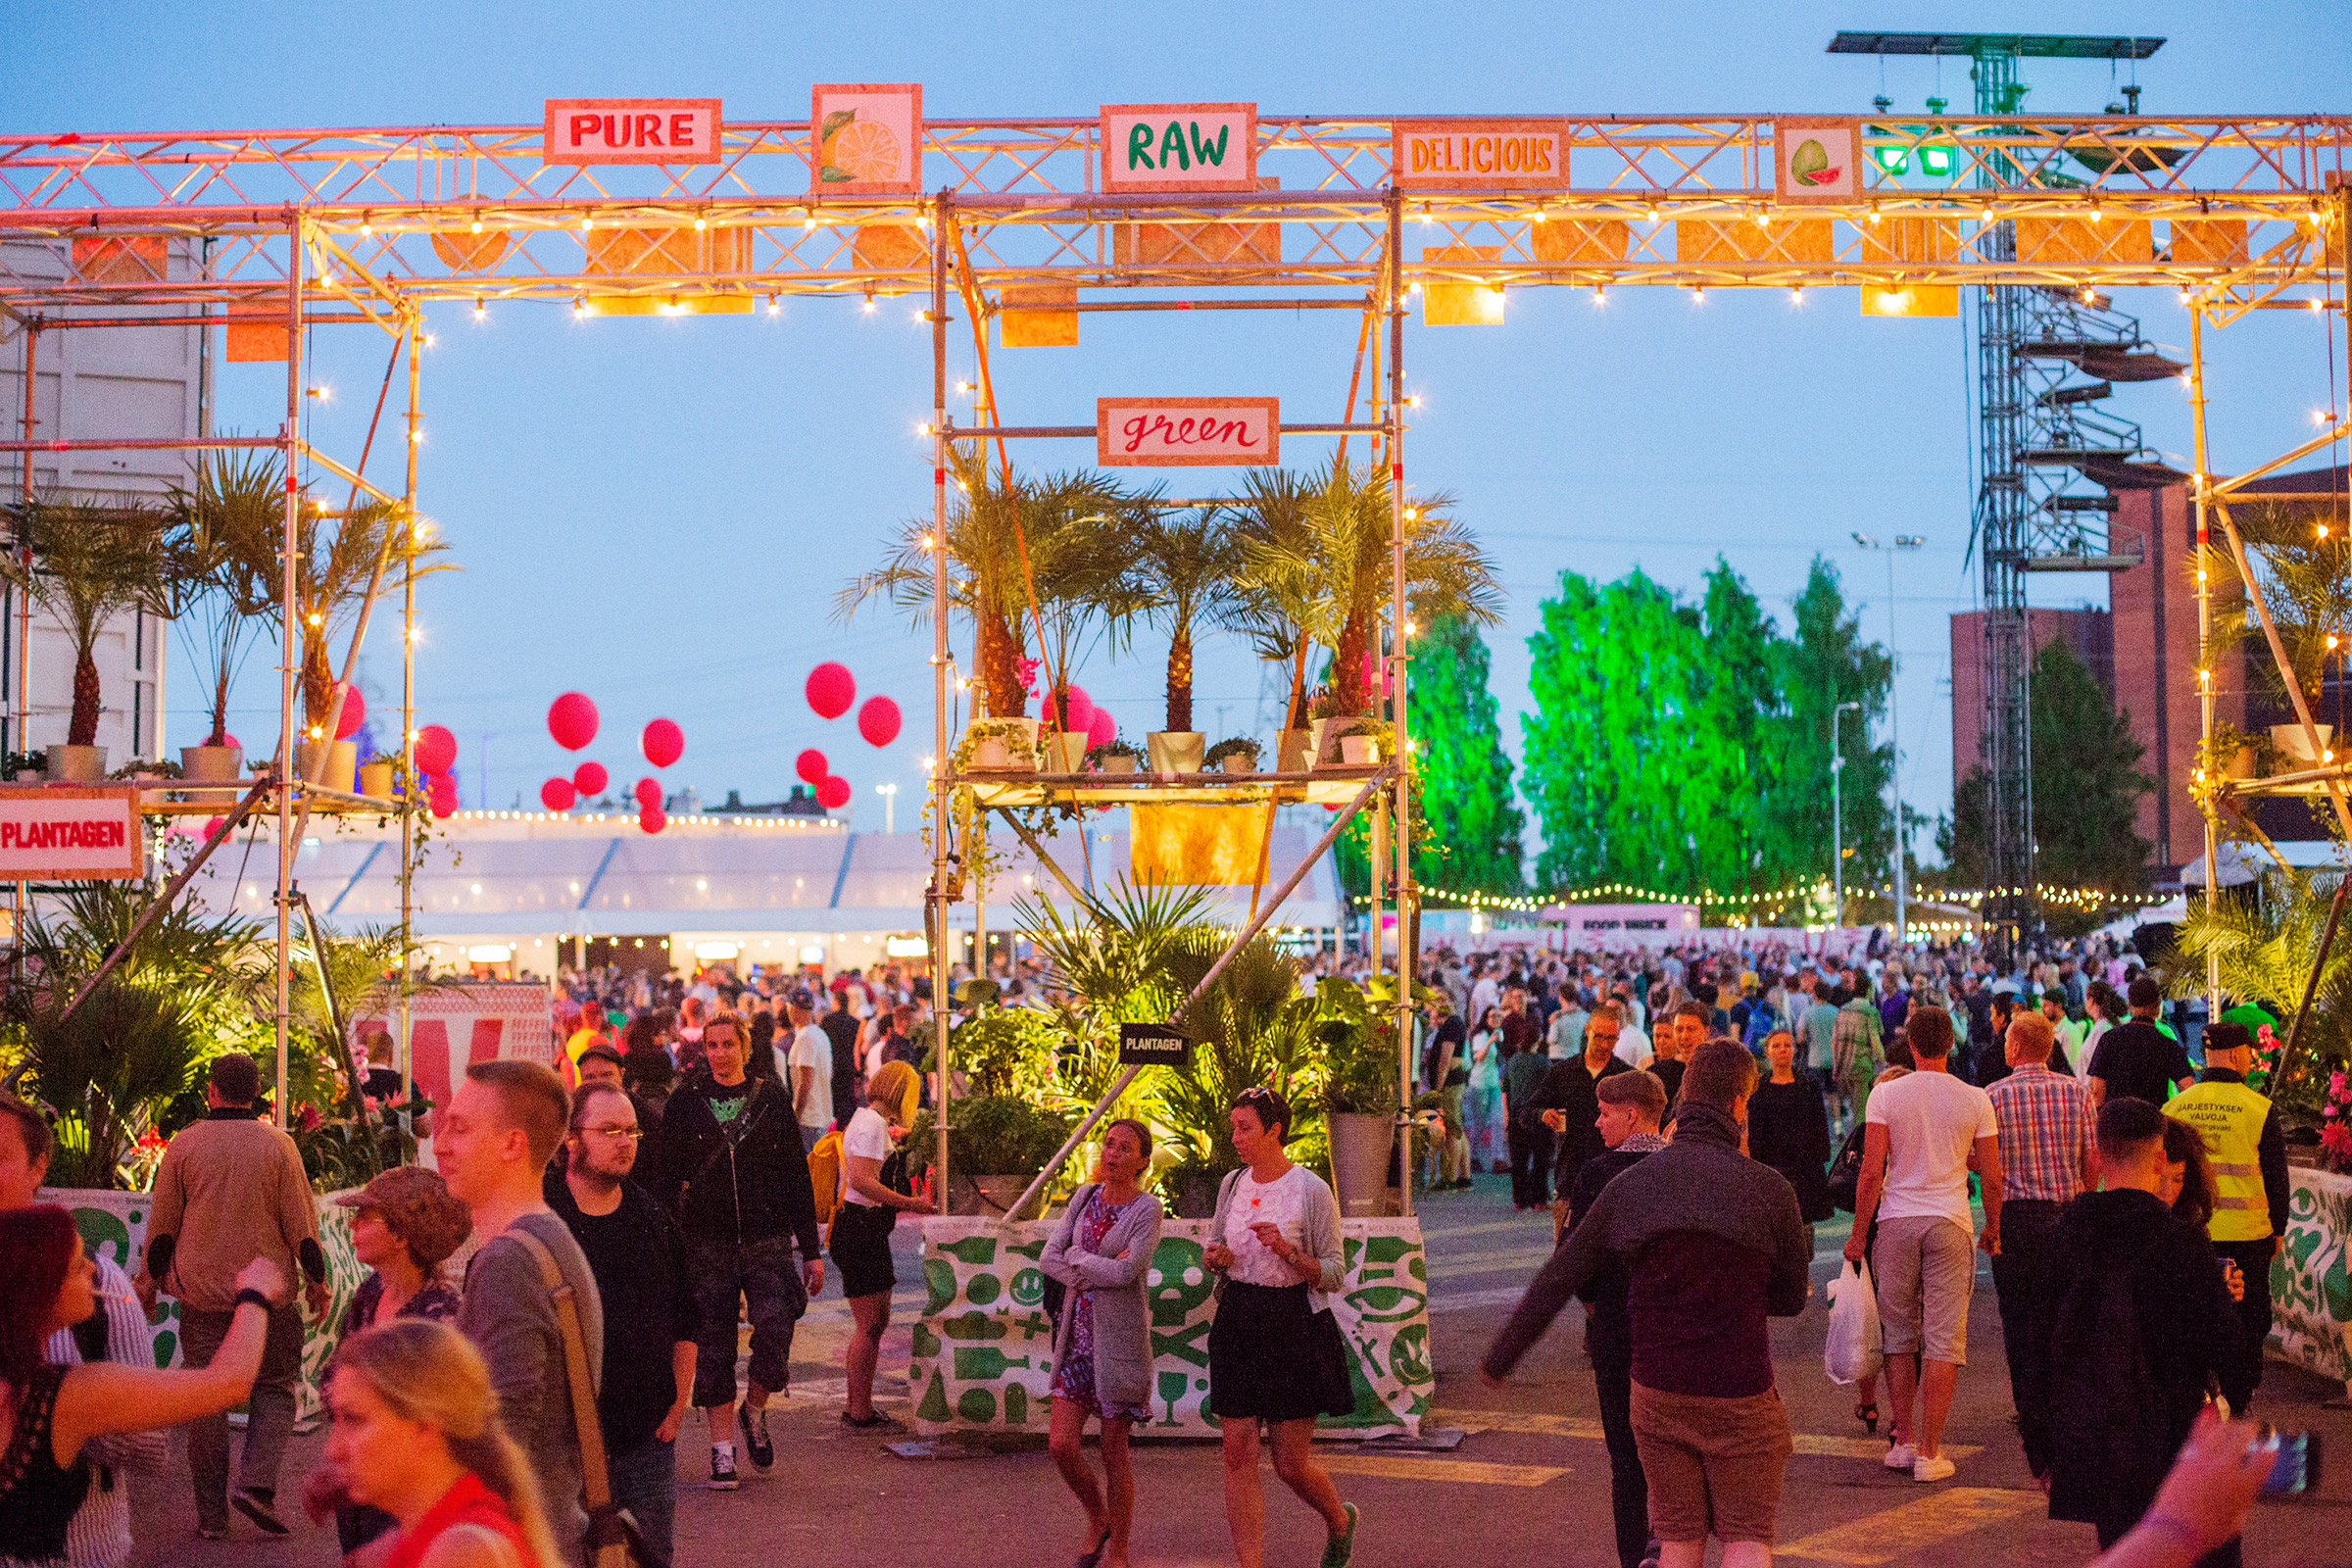 Eden area at Flow Festival 2015